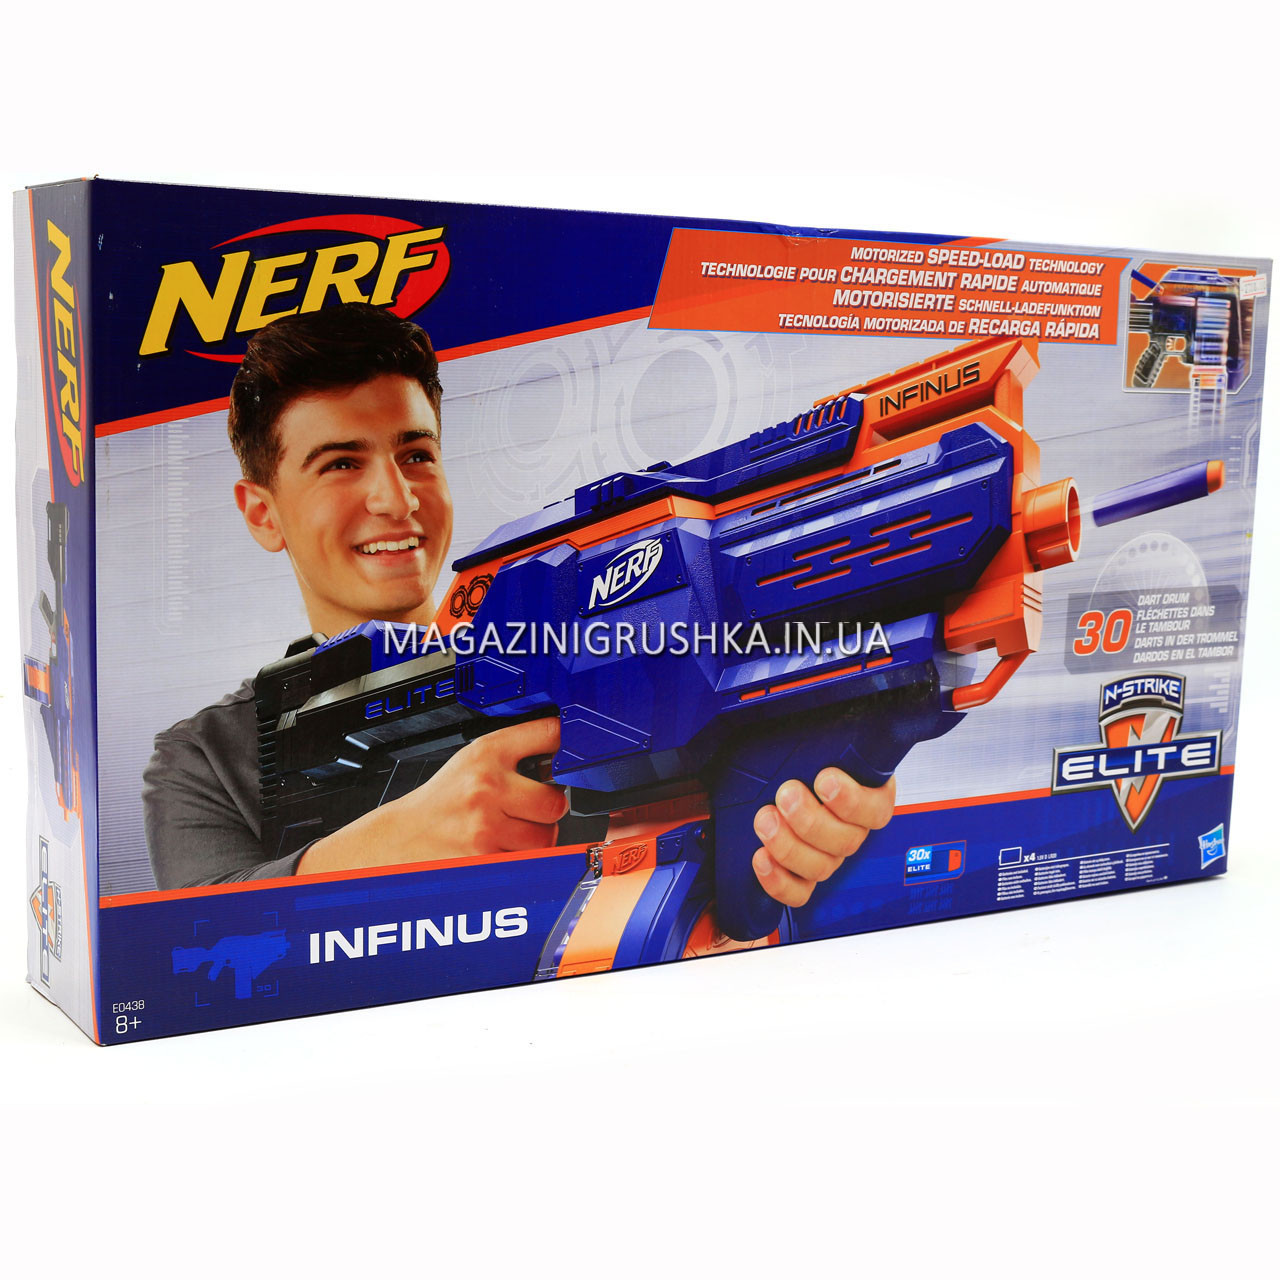 Бластер Hasbro Nerf Инфинус E0438